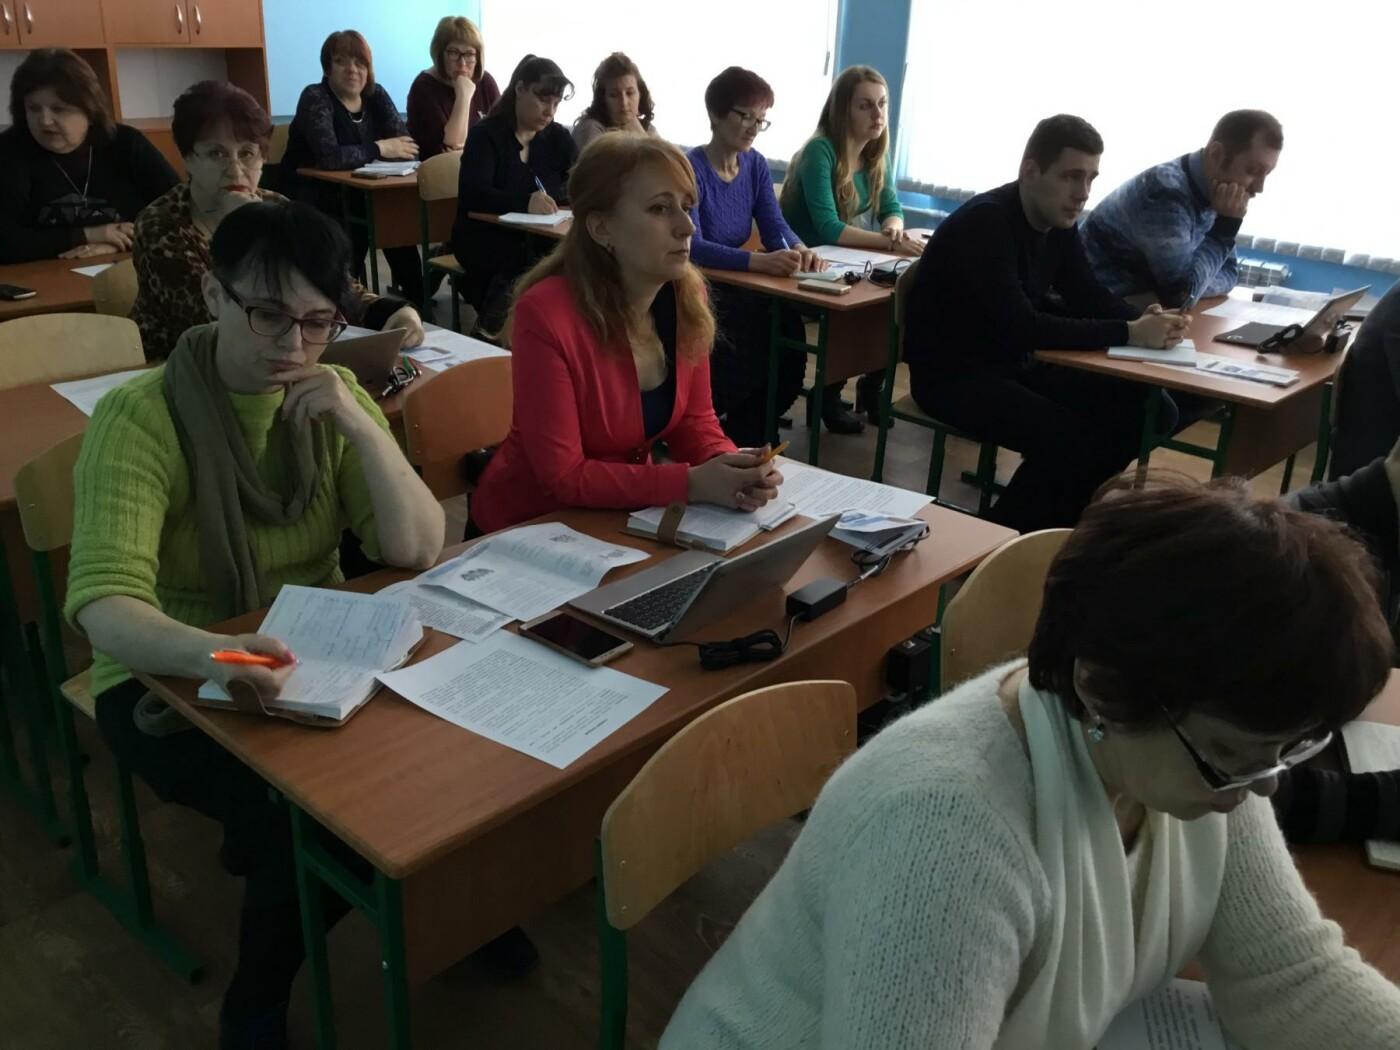 На базе дружковской ОШ №17 провели областной технопарк (ФОТО, ВИДЕО), фото-6